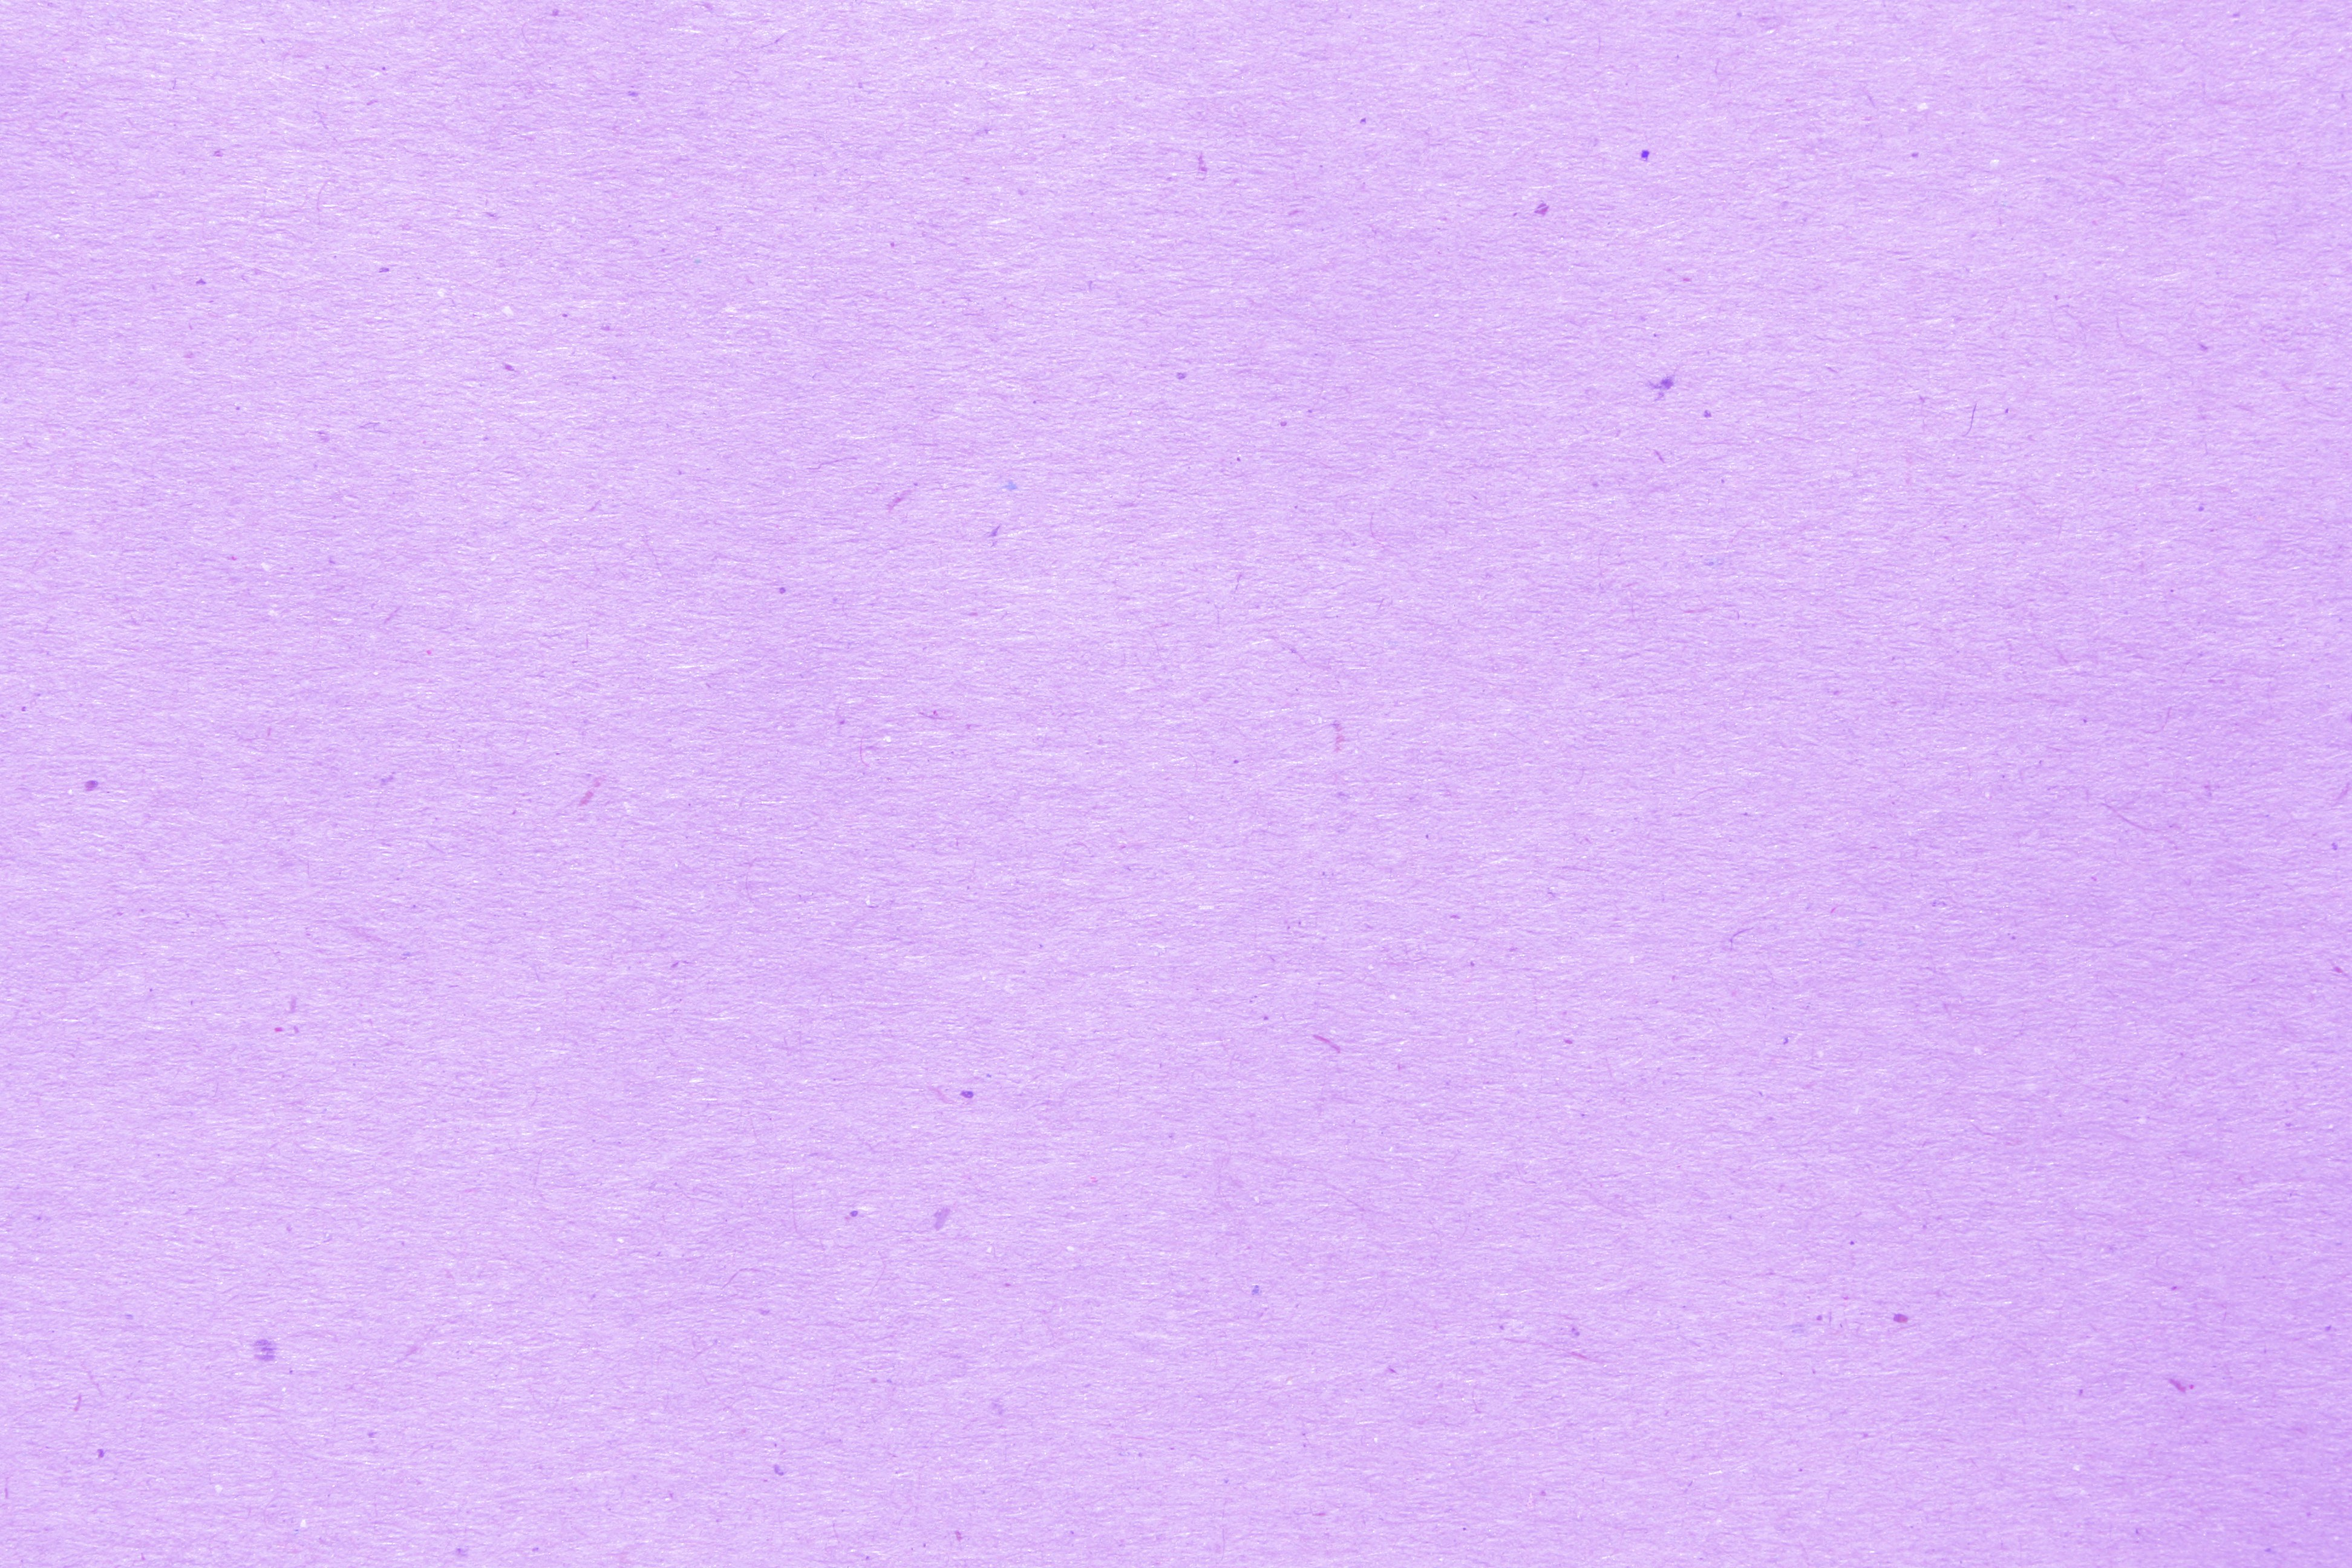 Light purple backgrounds wallpapersafari - Wallpaper lavender color ...